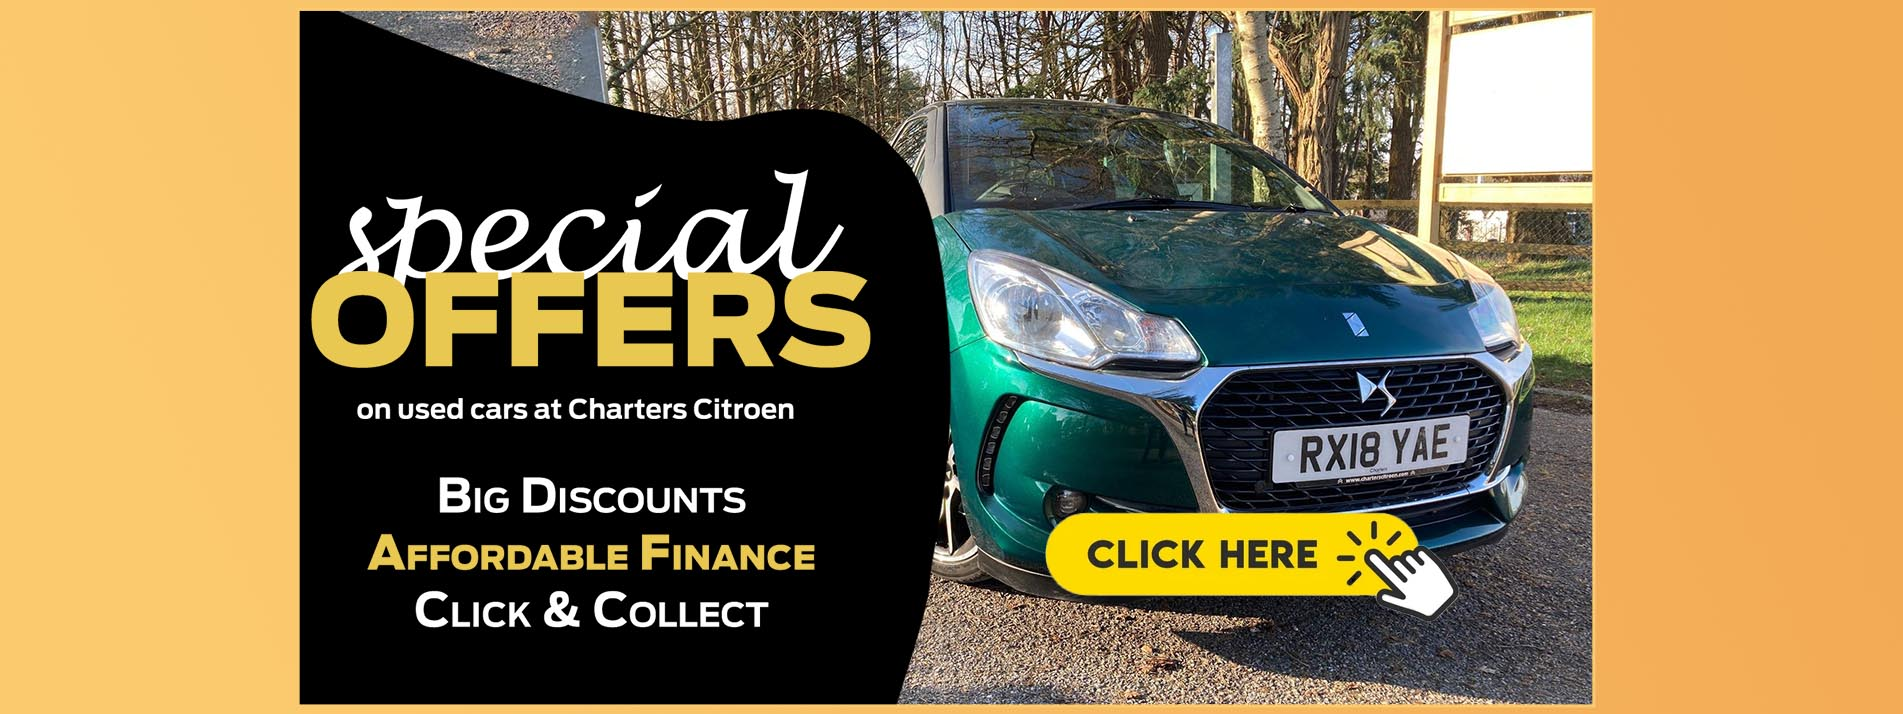 used-car-special-offers-citroen-aldershot-m-sli2